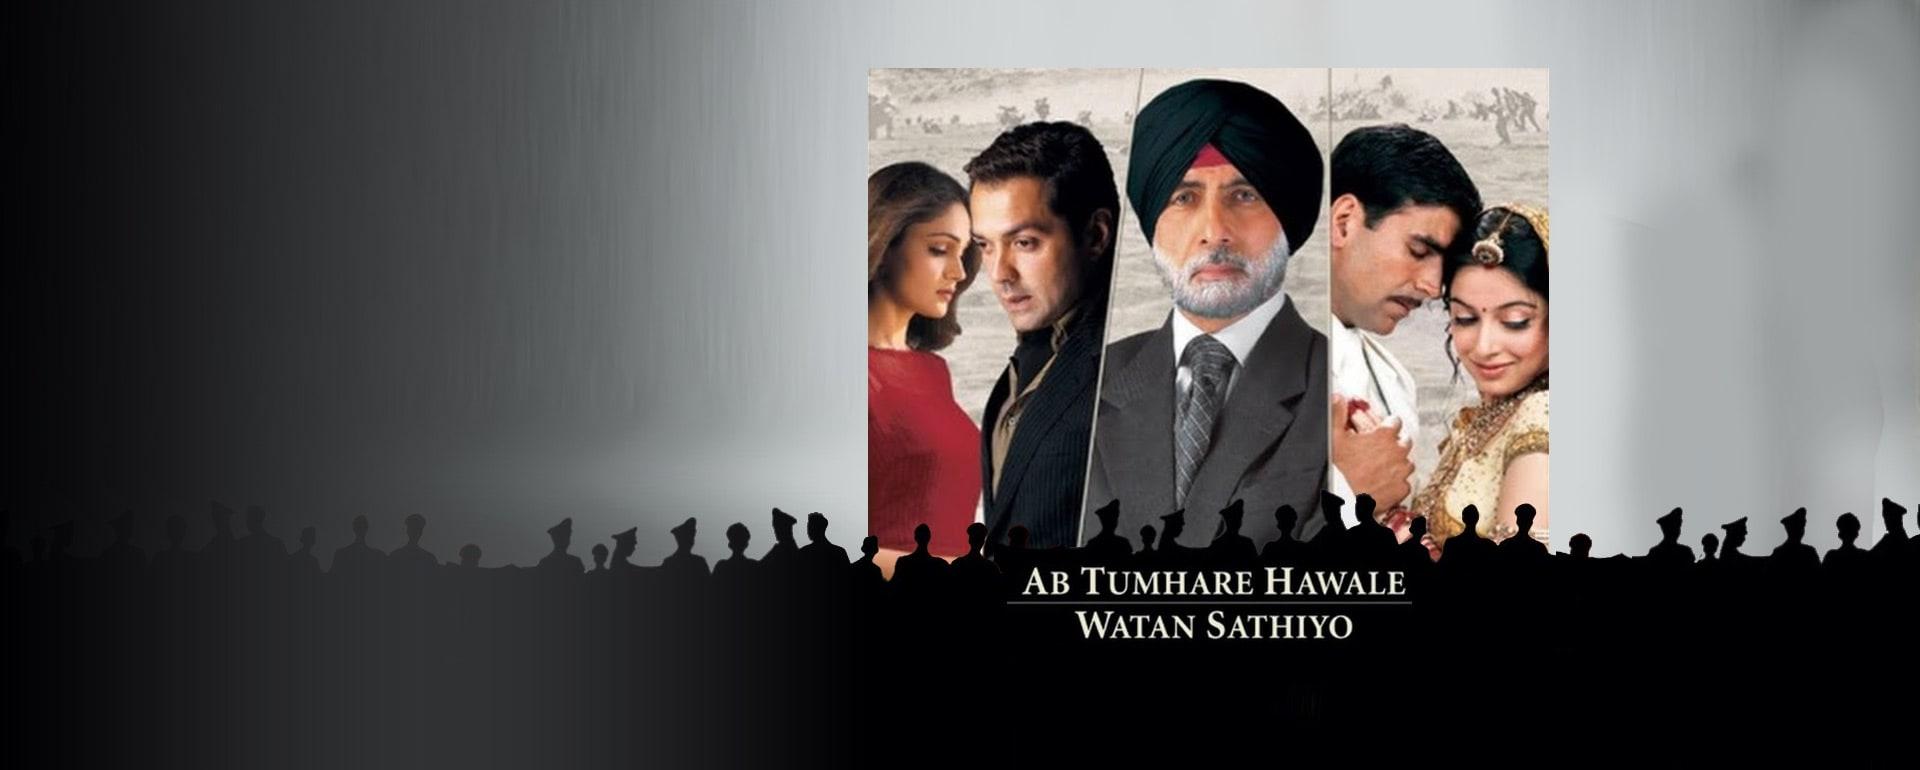 Watch Ab Tumhare Hawale Watan Sathiyo Tamil Full Movie Online